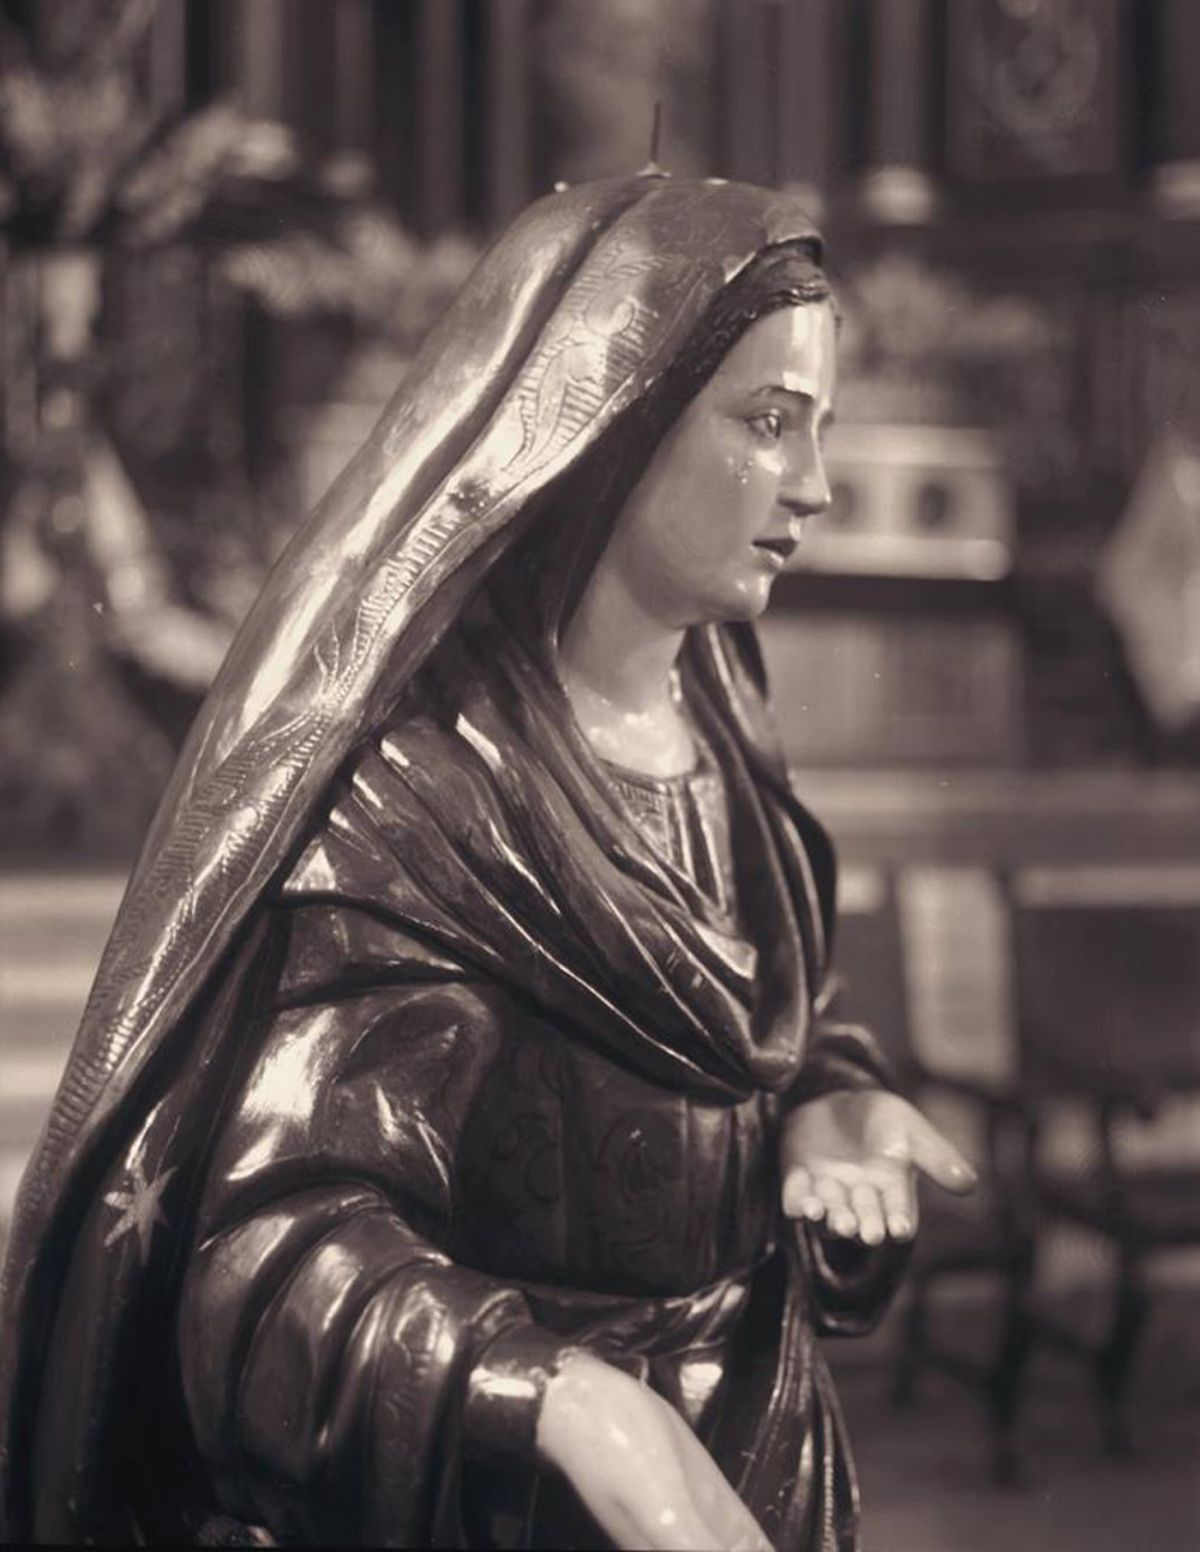 Virgin in San Francisco Church artwork by Juan Borja - art listed for sale on Artplode